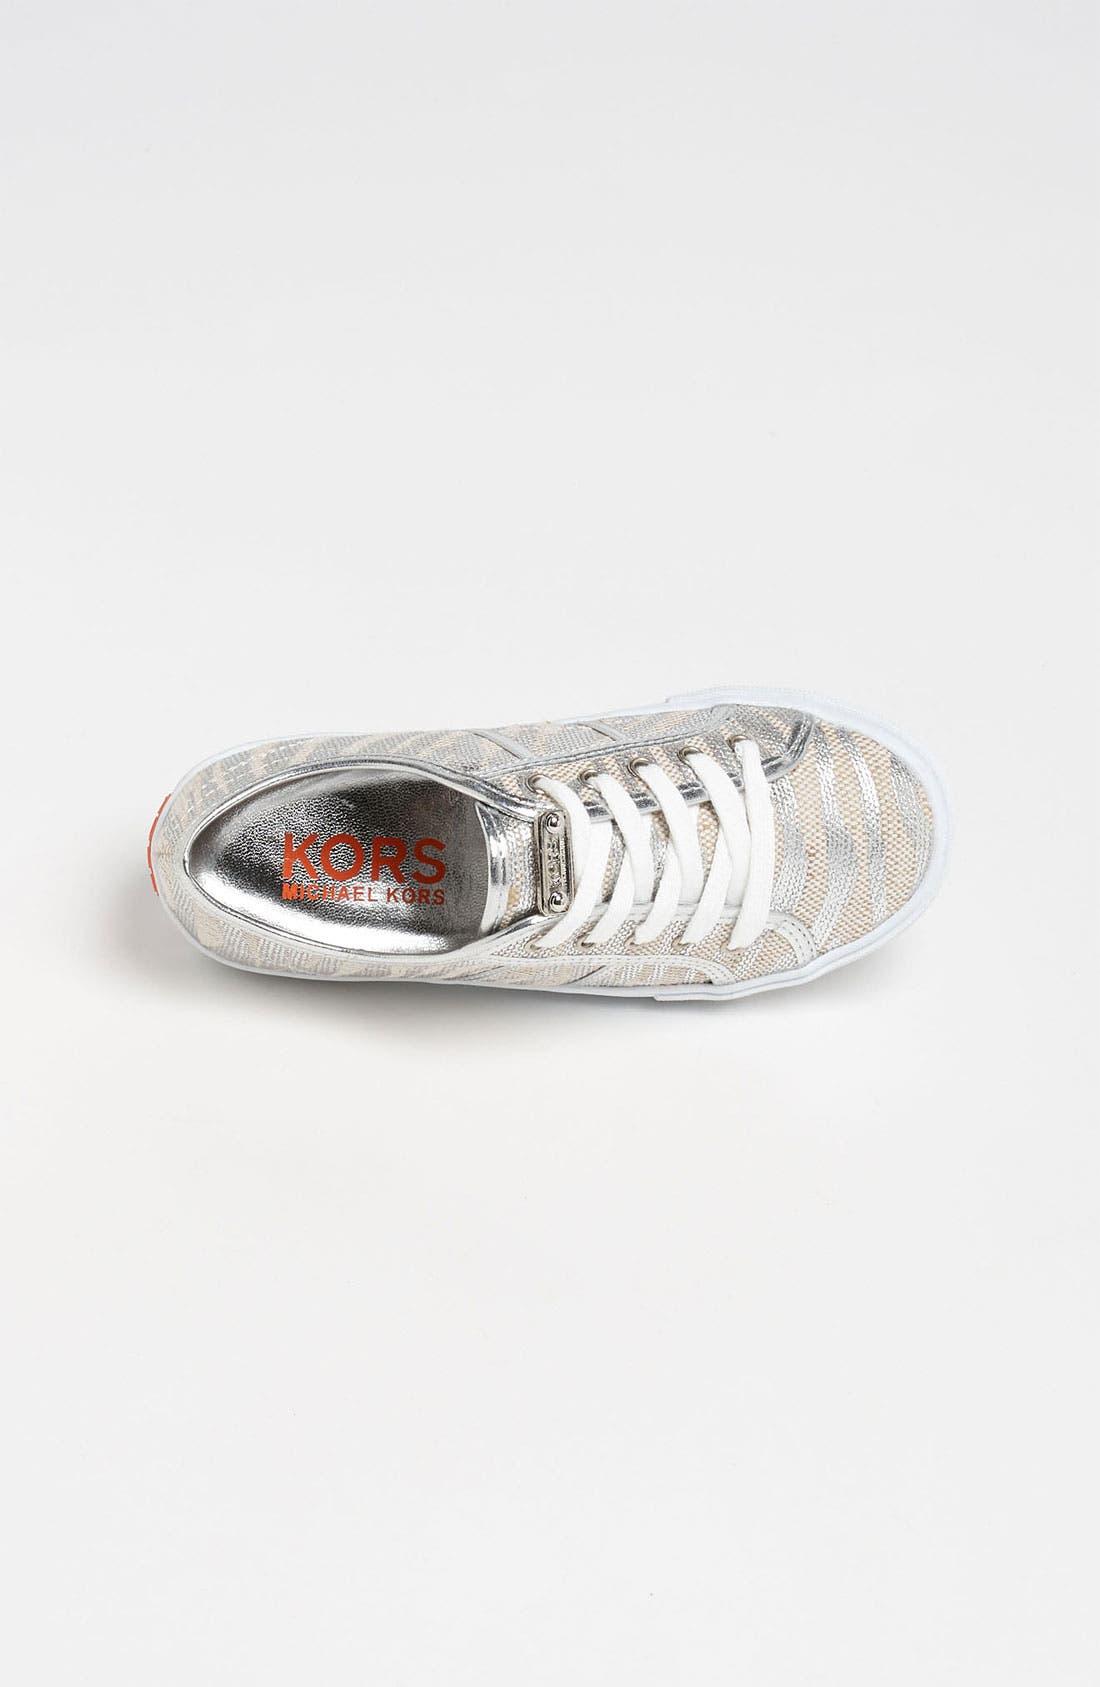 Alternate Image 3  - KORS Michael Kors 'Snapdragon' Sneaker (Toddler, Little Kid & Big Kid)